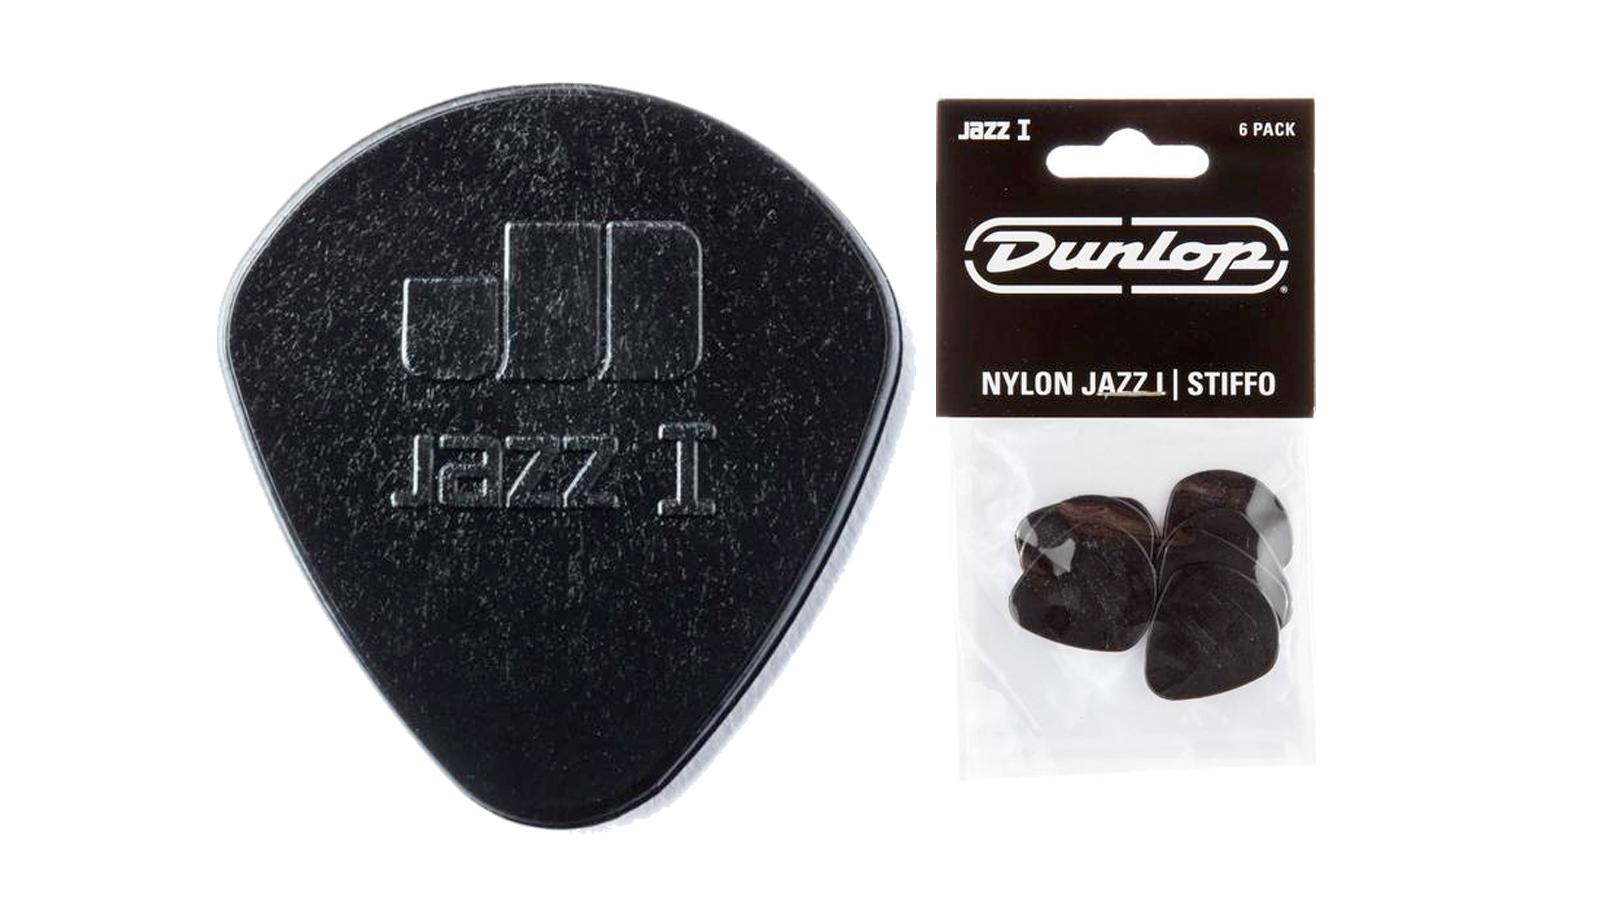 Dunlop Stiffo Jazz I Plektrum 1,1 mm 6 Stück schwarz